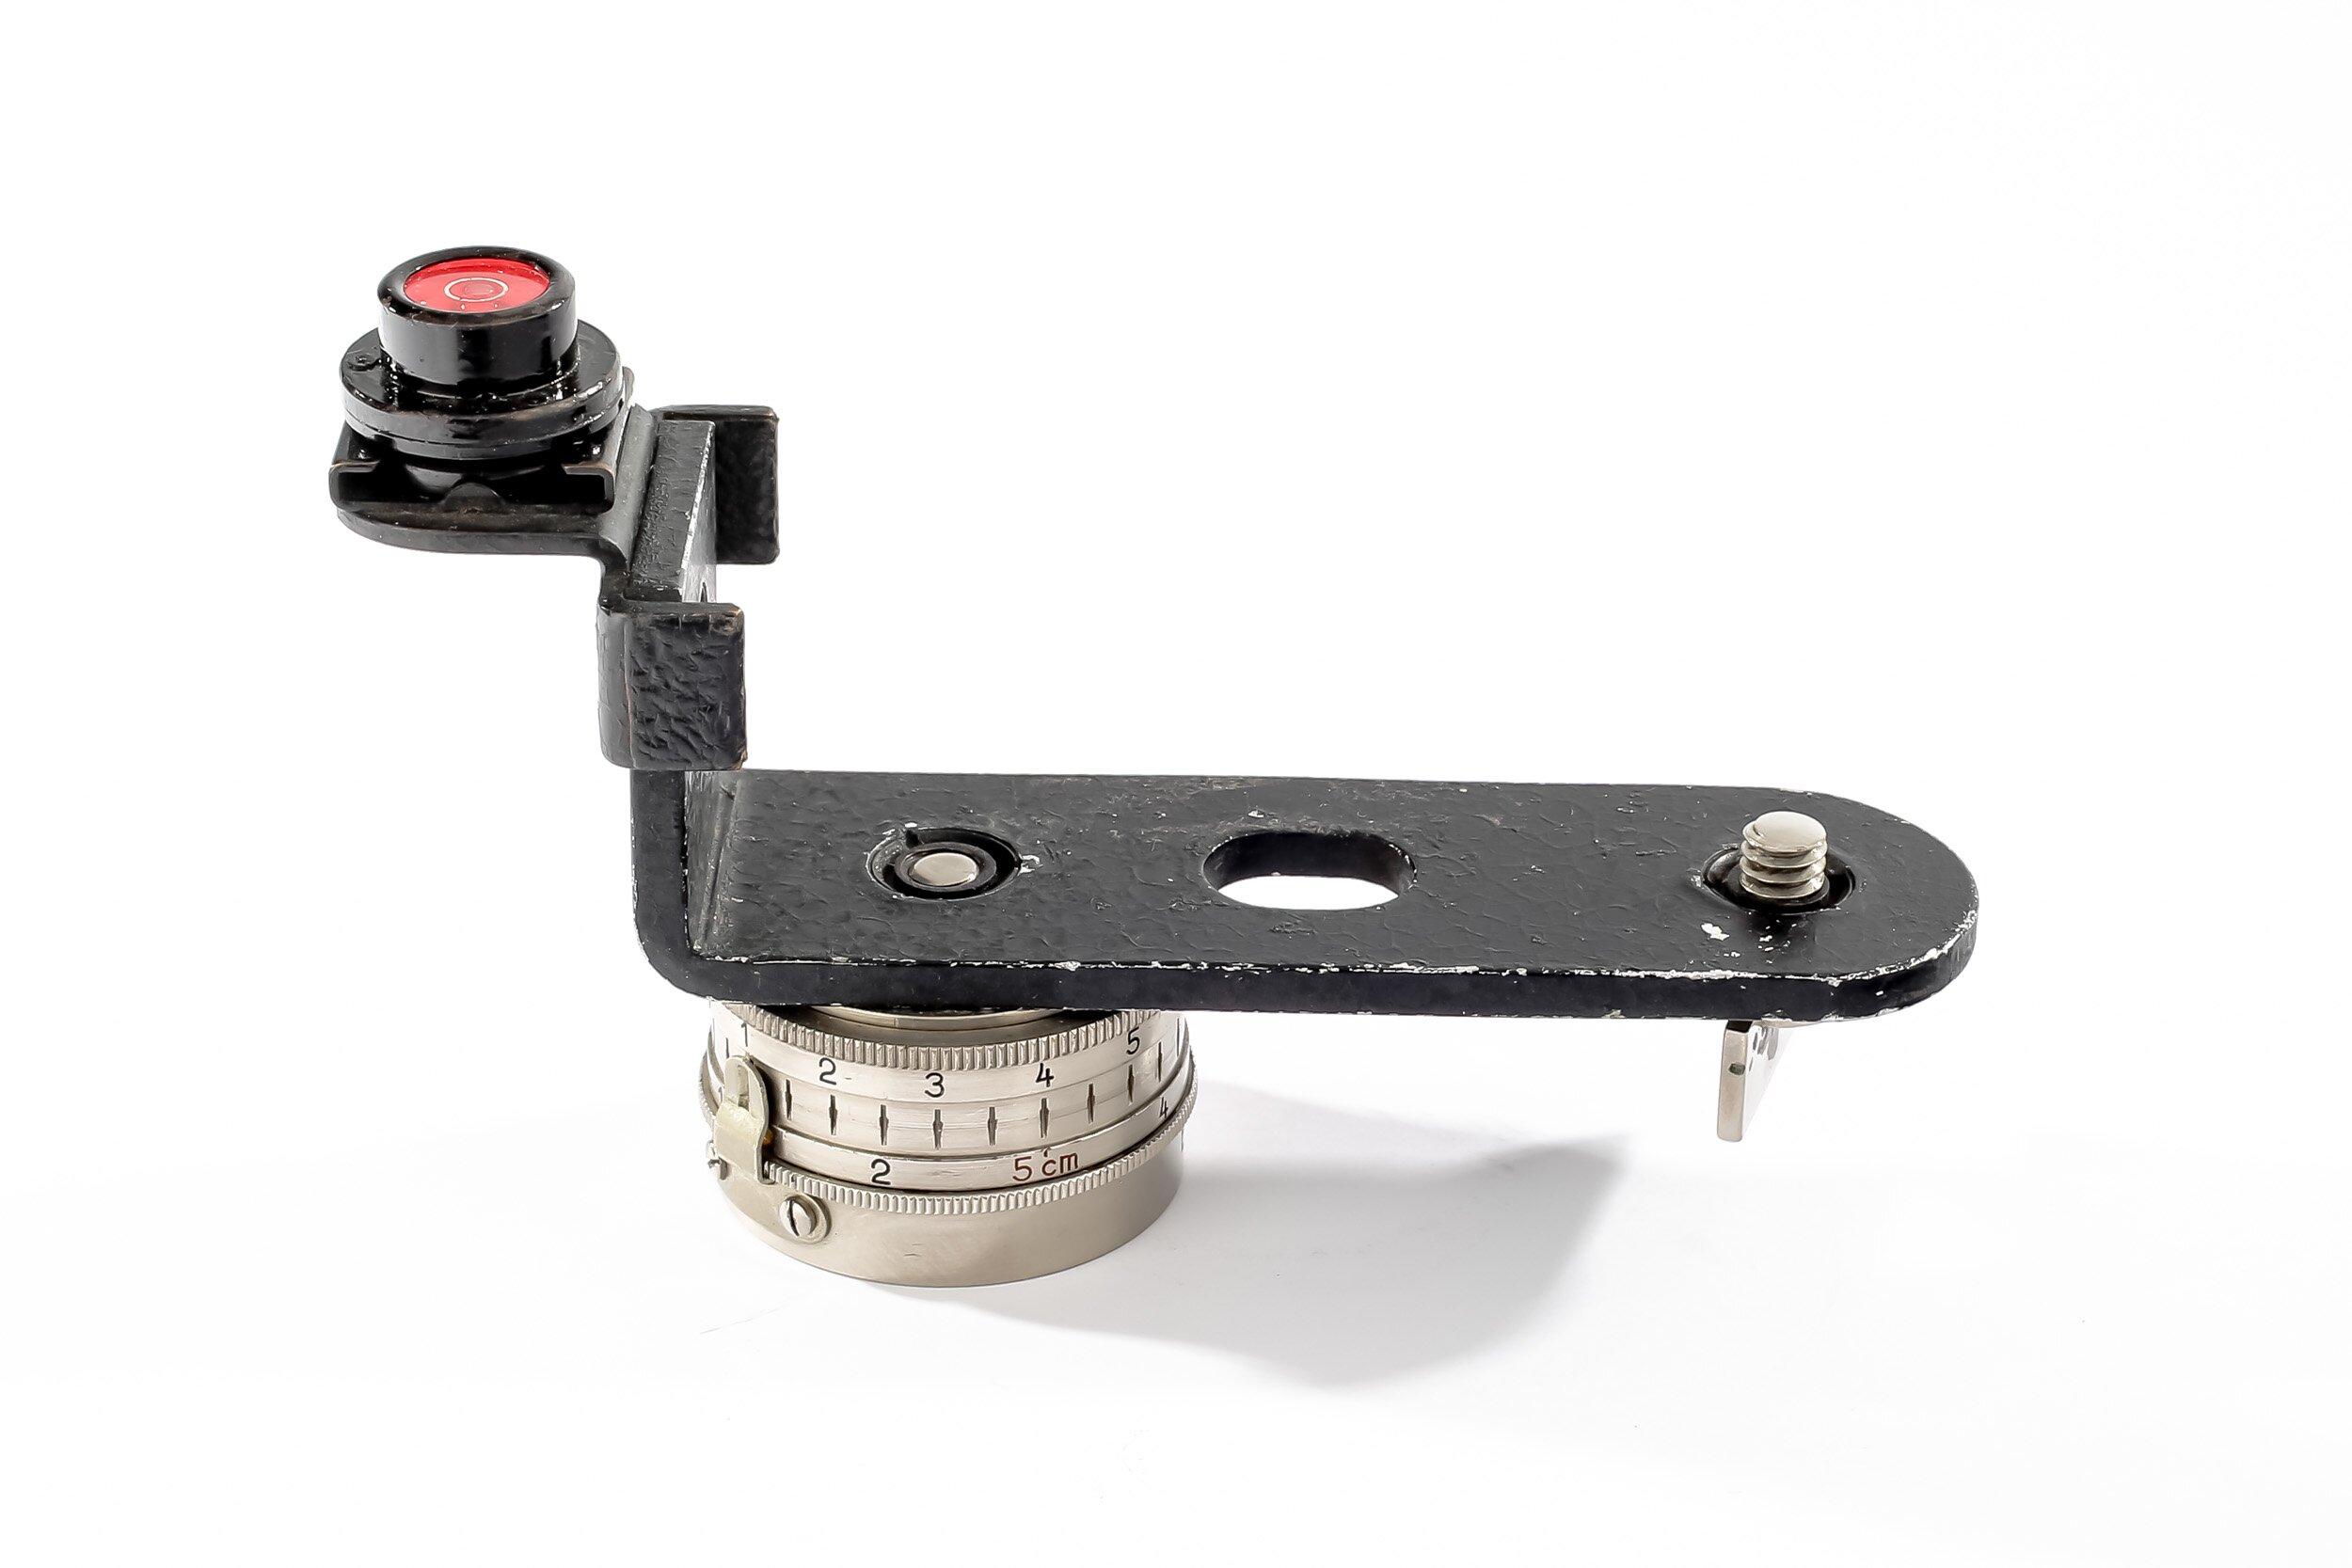 Leica Panoramakopf + Winkelschiene + Wasserwaage